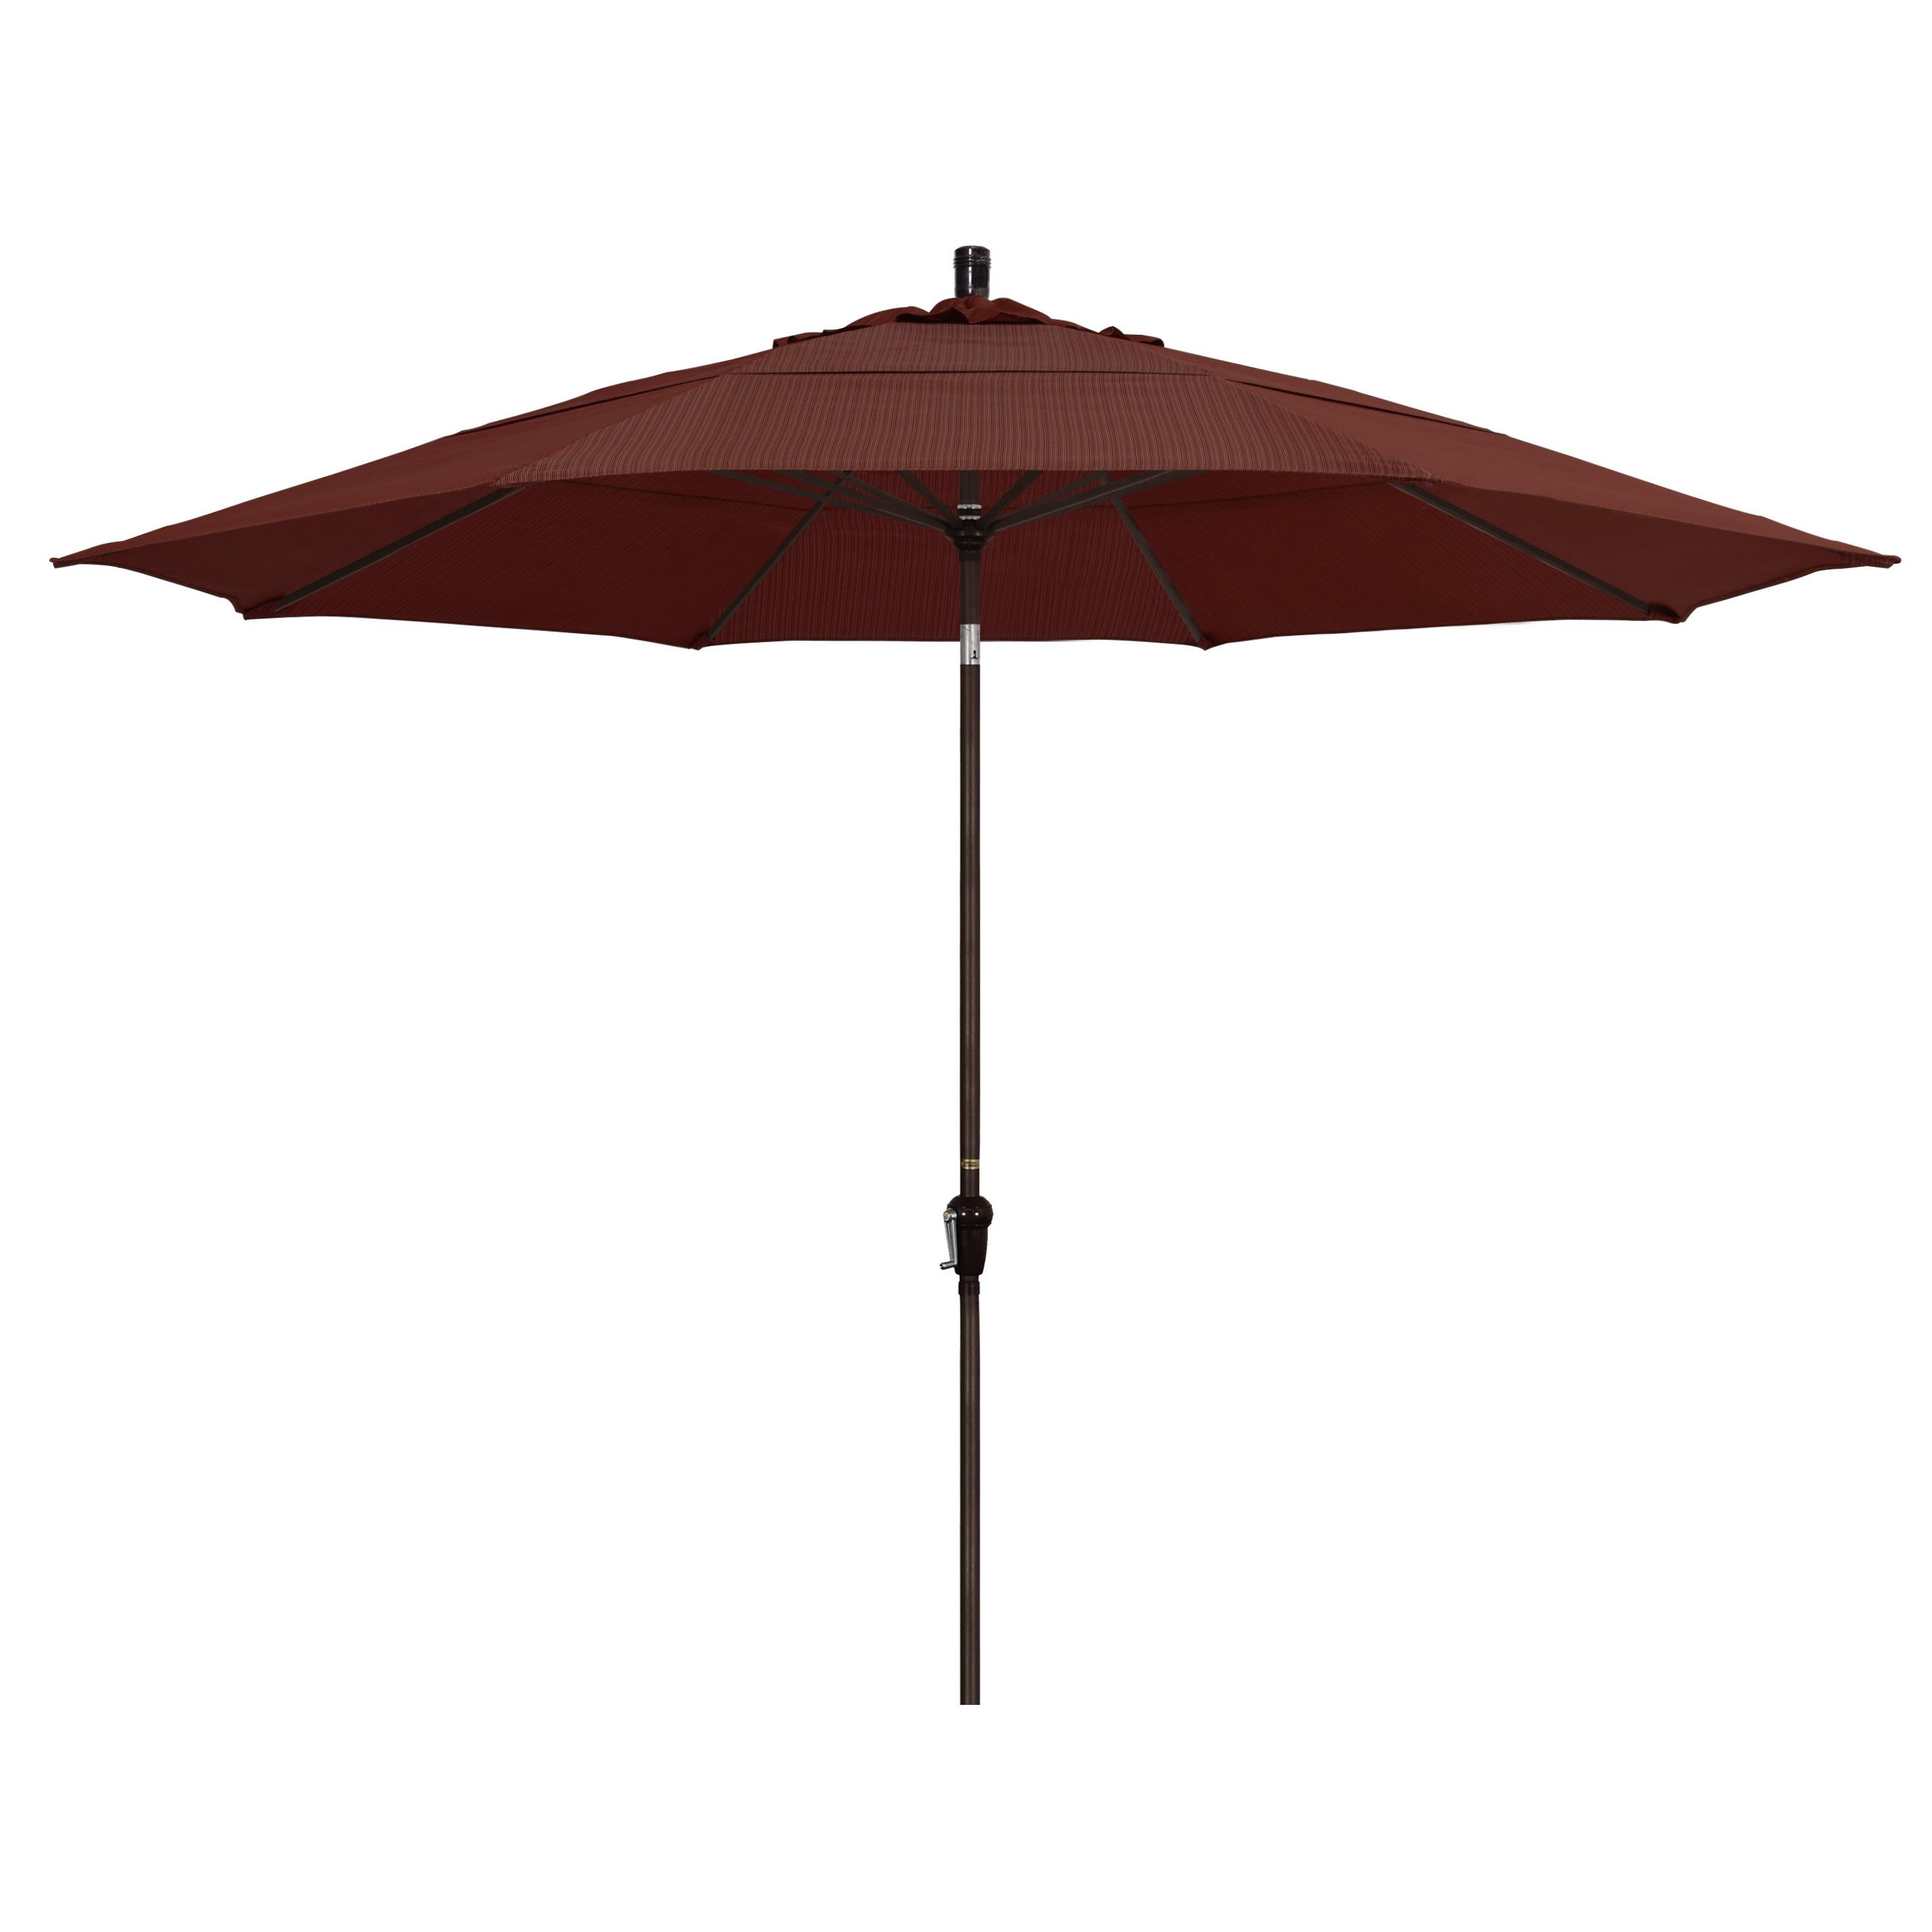 Mullaney Beachcrest Home Market Umbrellas In 2020 Mullaney 11' Market Umbrella (View 3 of 20)